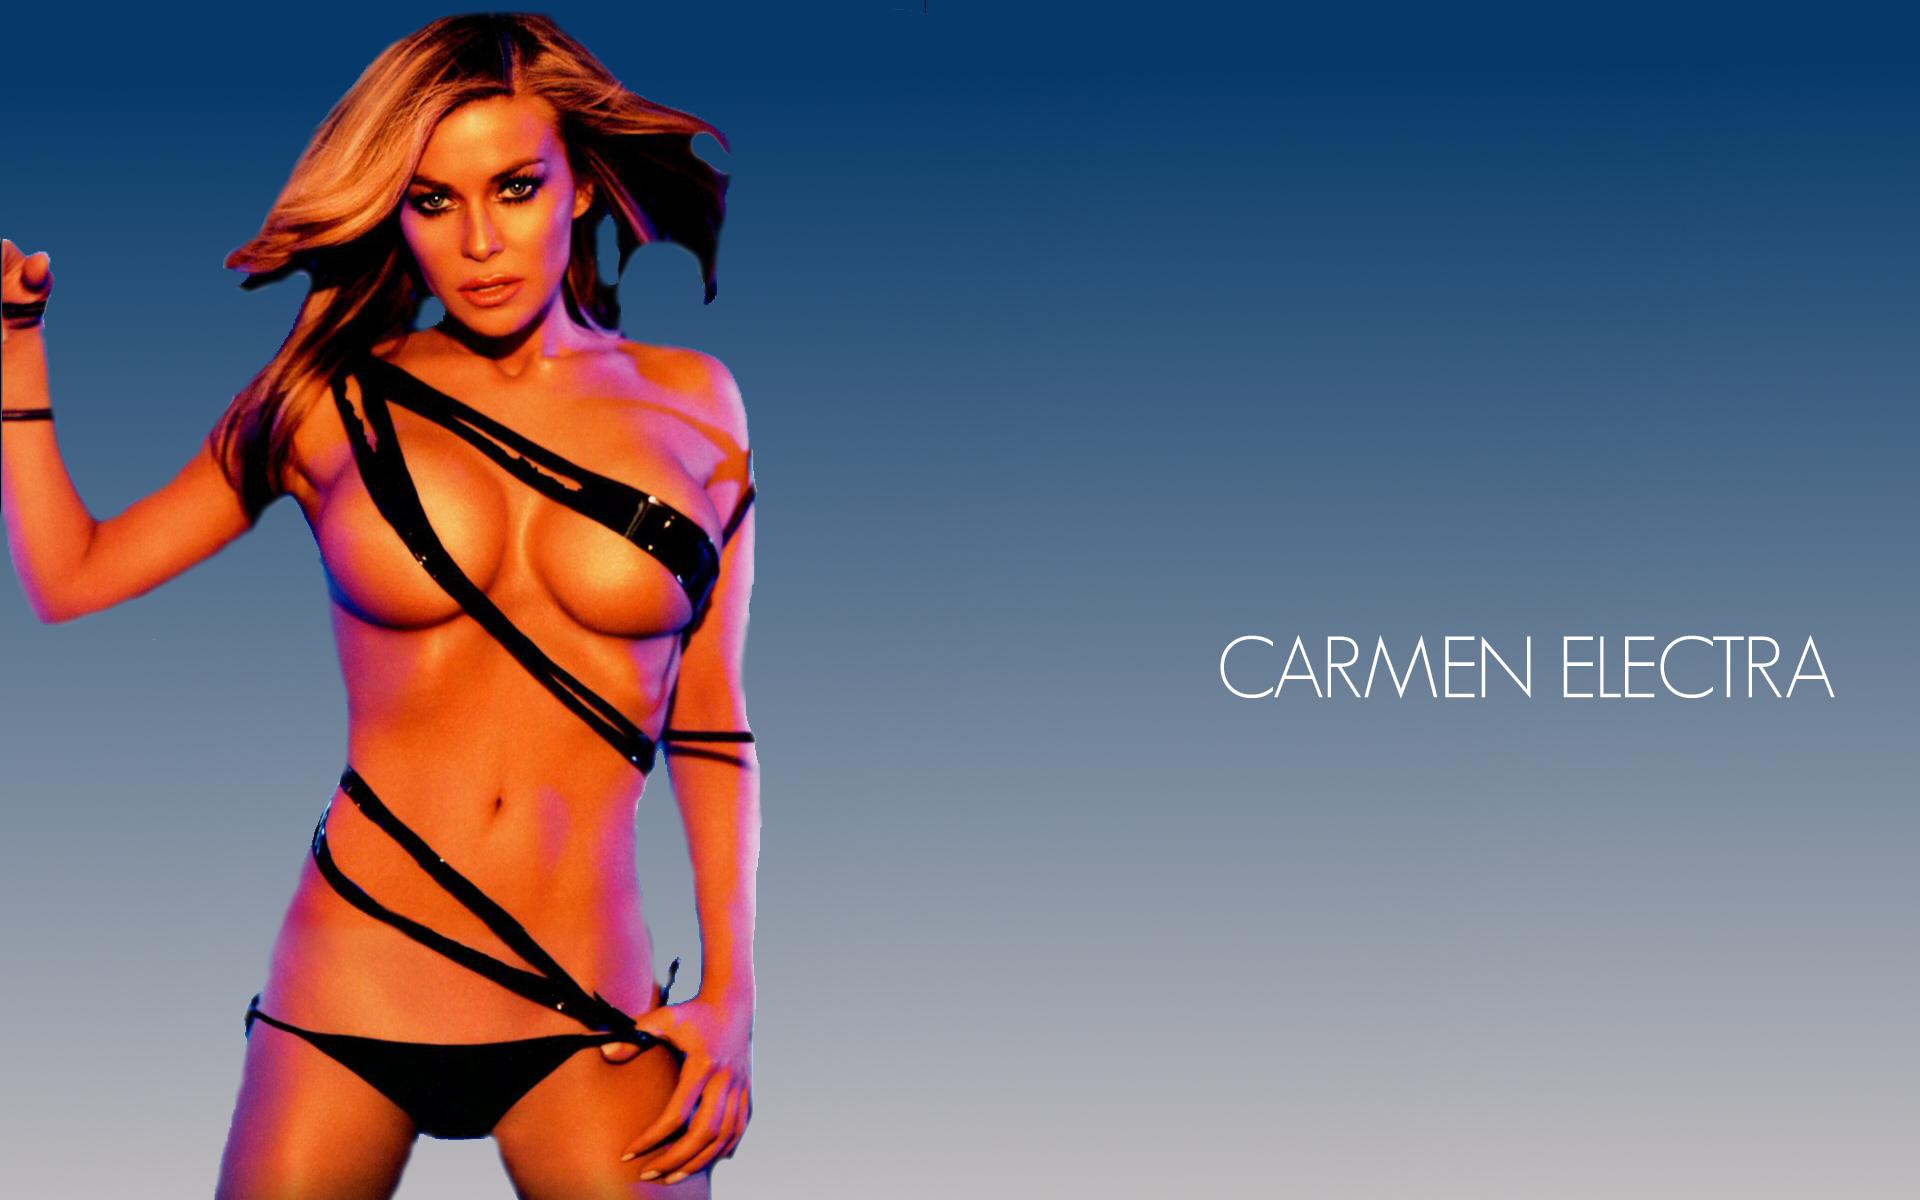 Carmen electra look